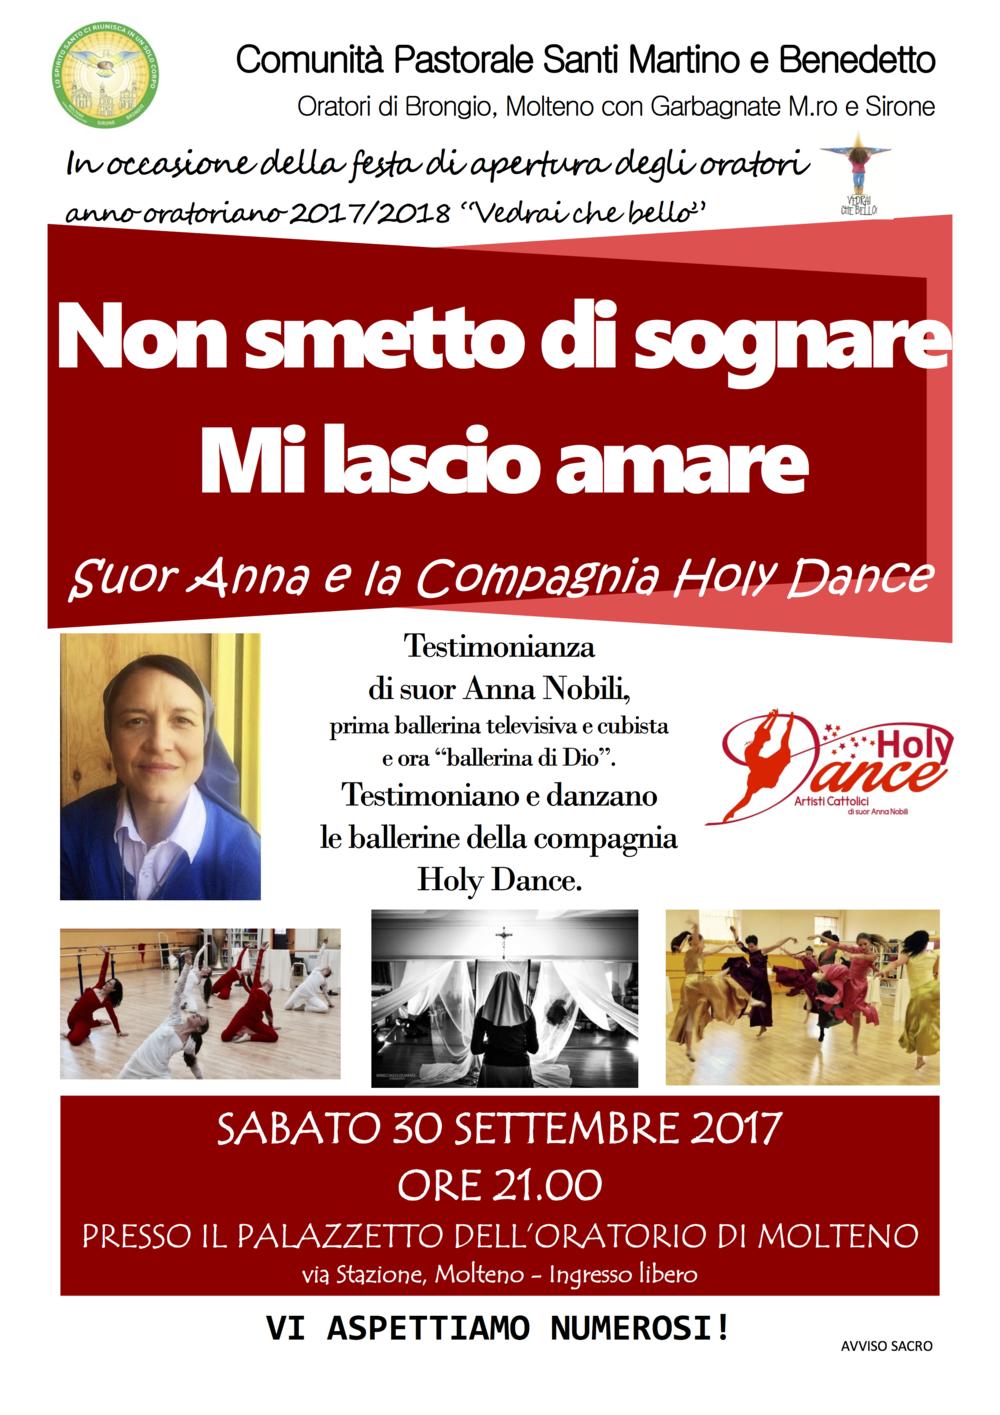 Testimonianza suor Anna Nobili 2017_definitivo.png